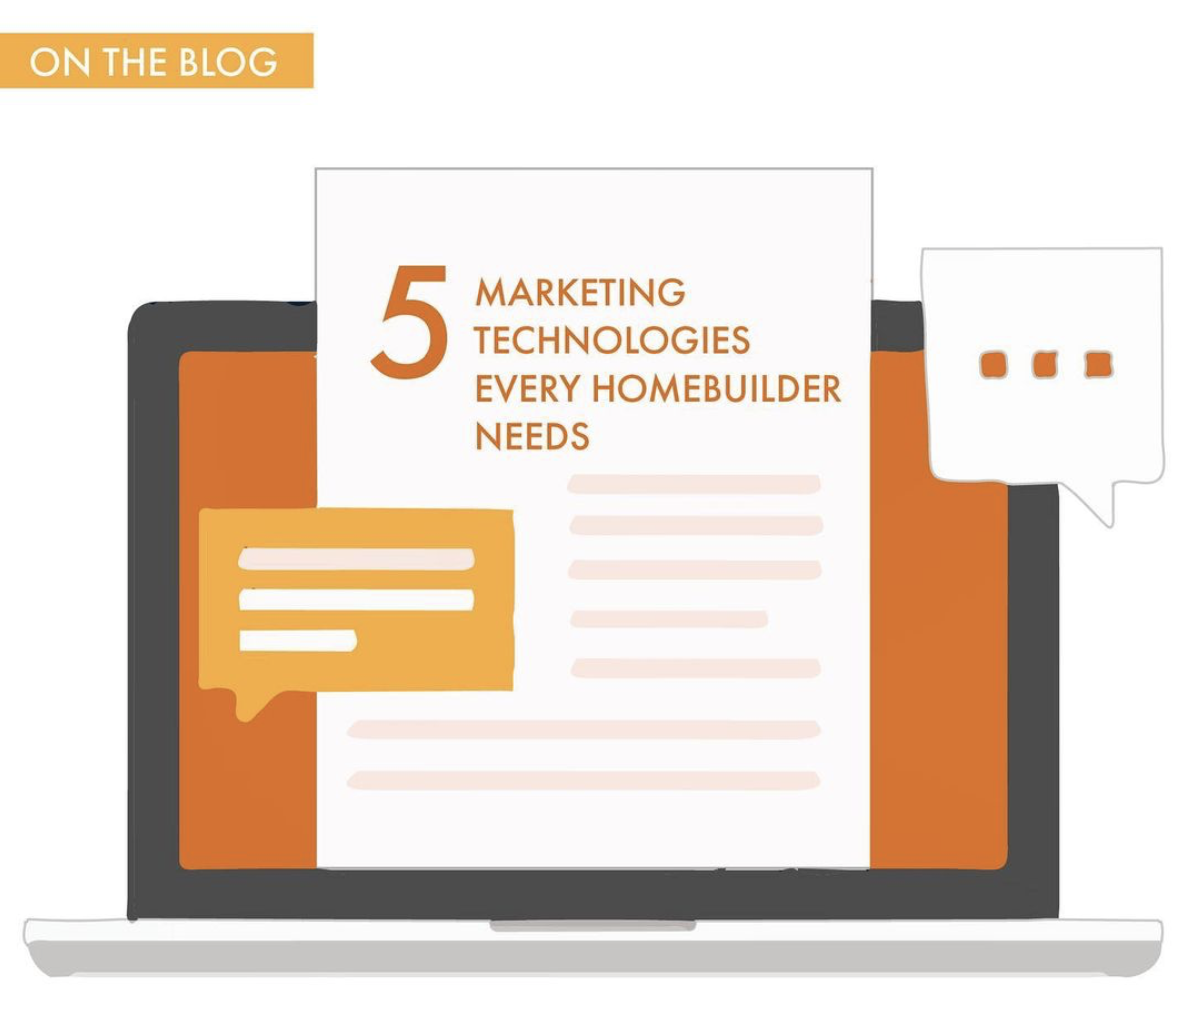 5 Marketing Technologies Every Homebuilder Needs